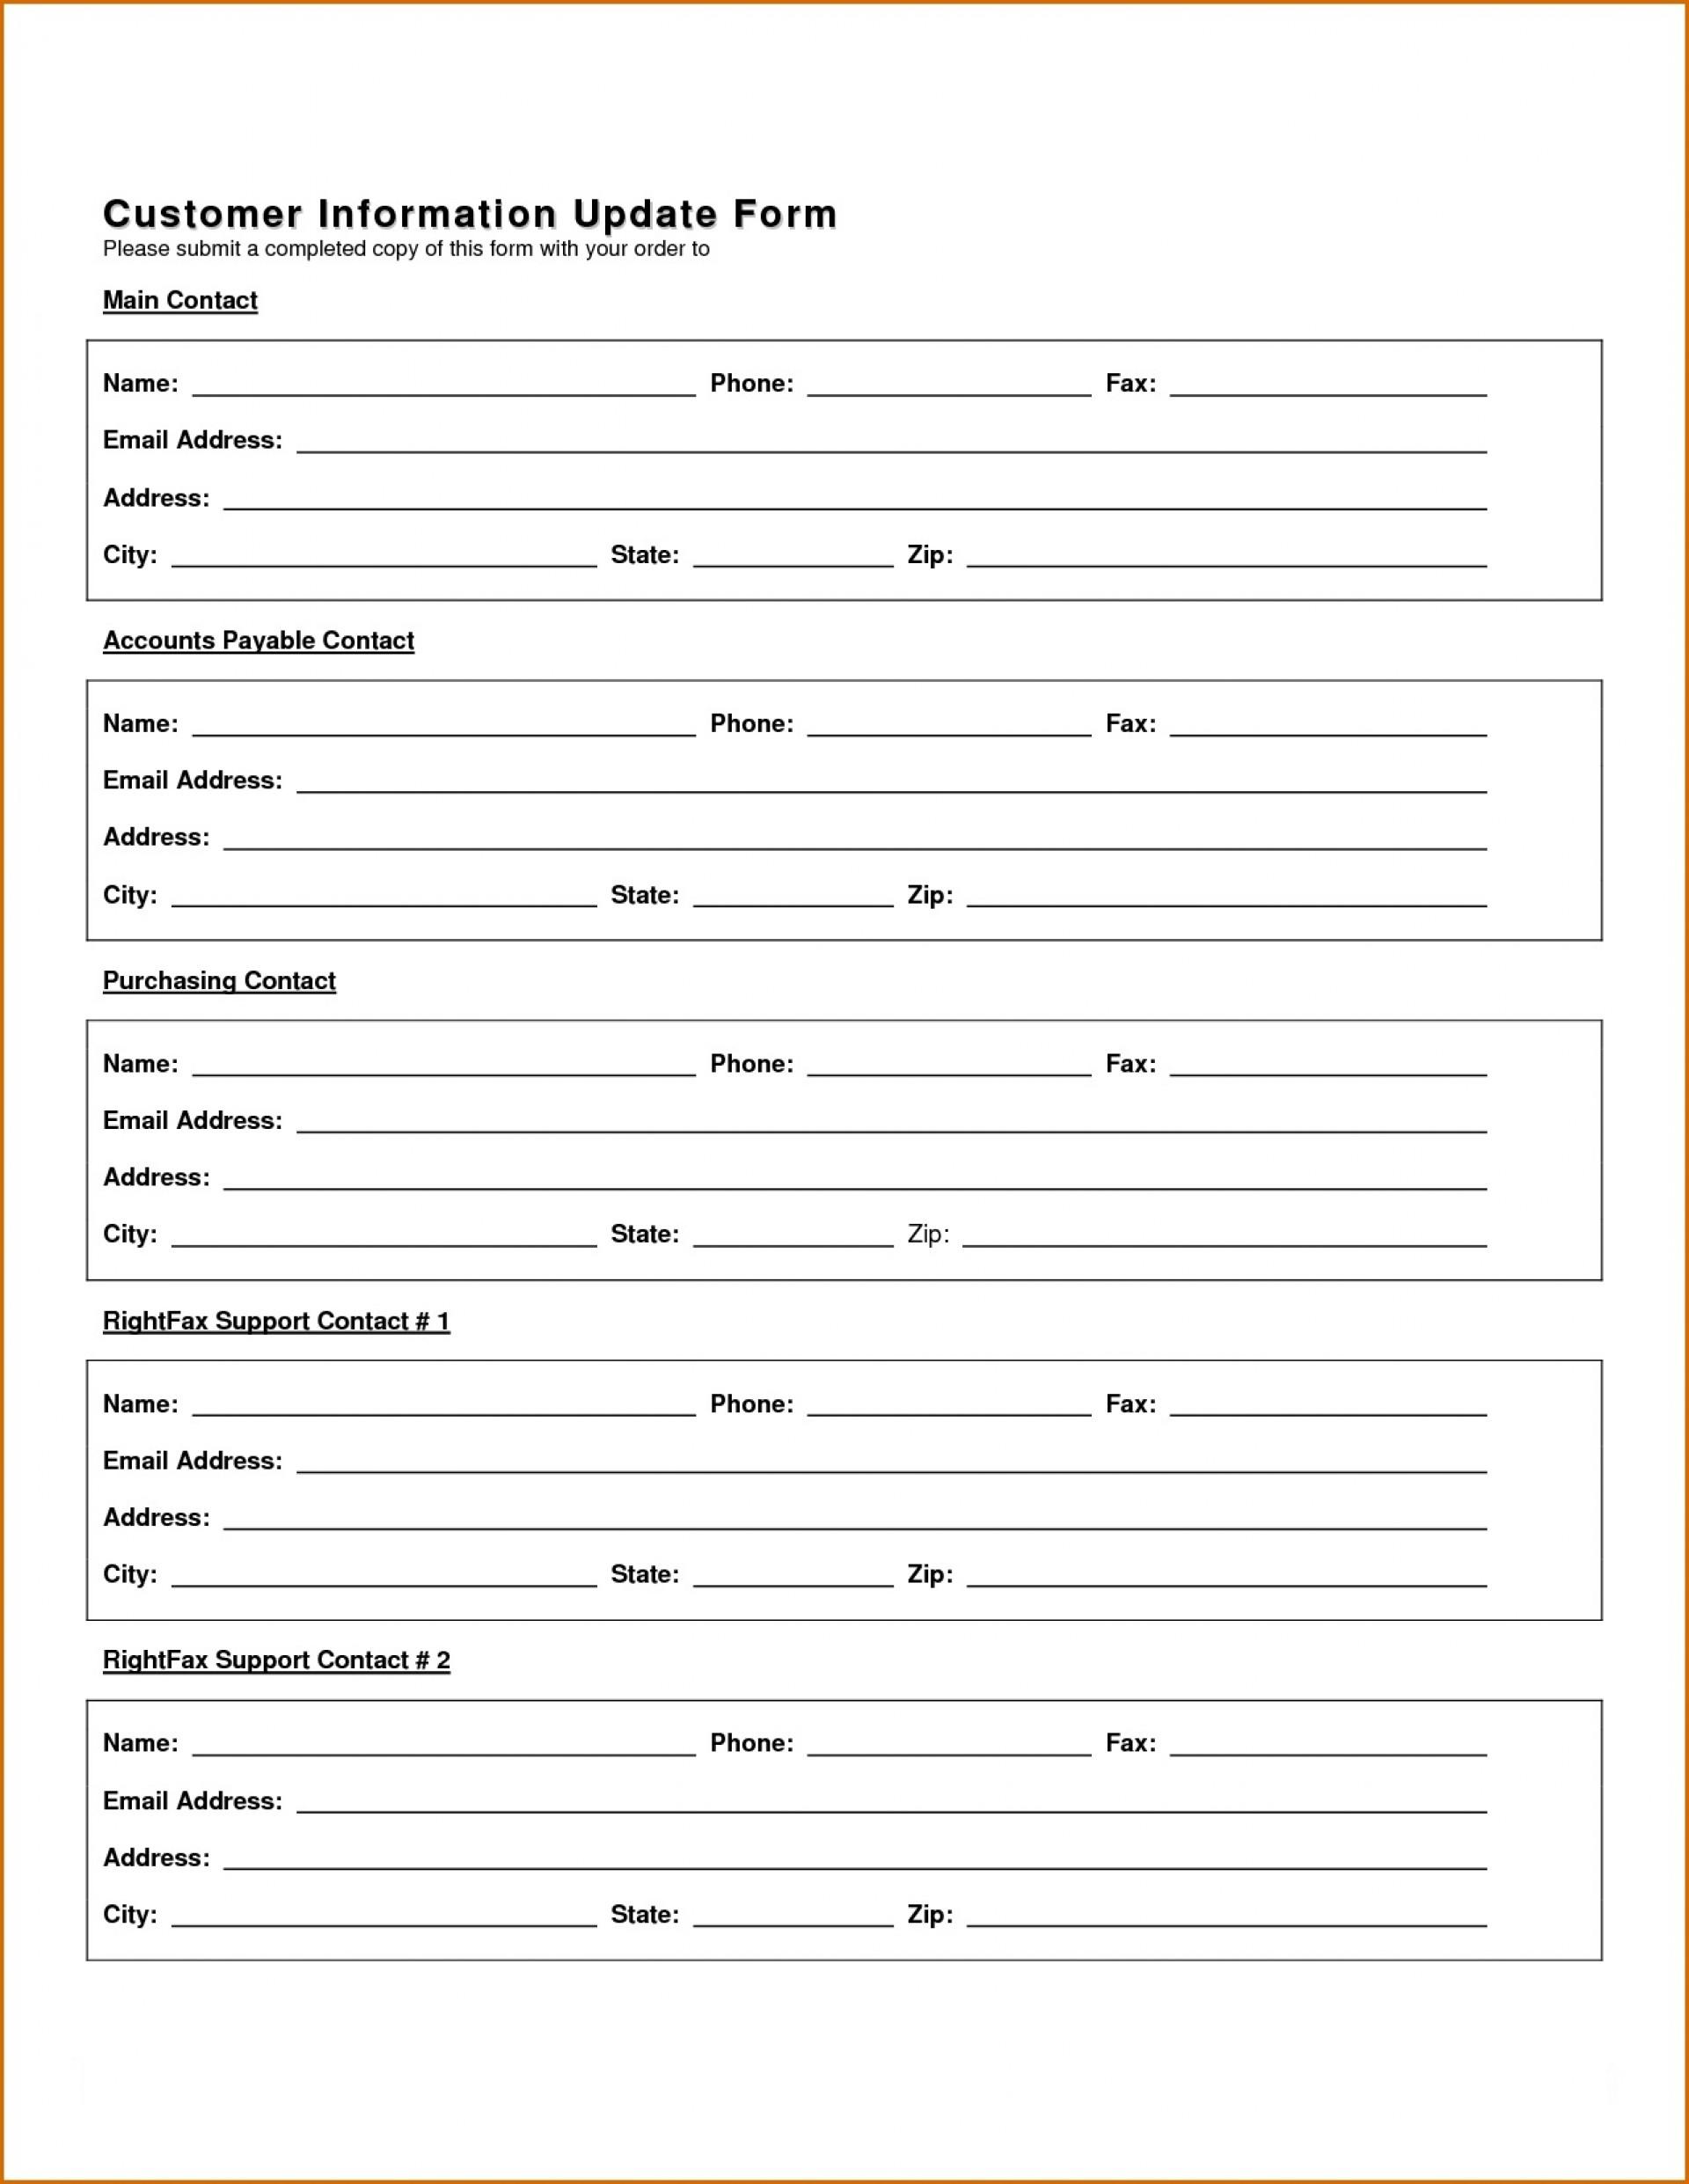 New Customer Information Update Form  Template Uk Account Setup1920